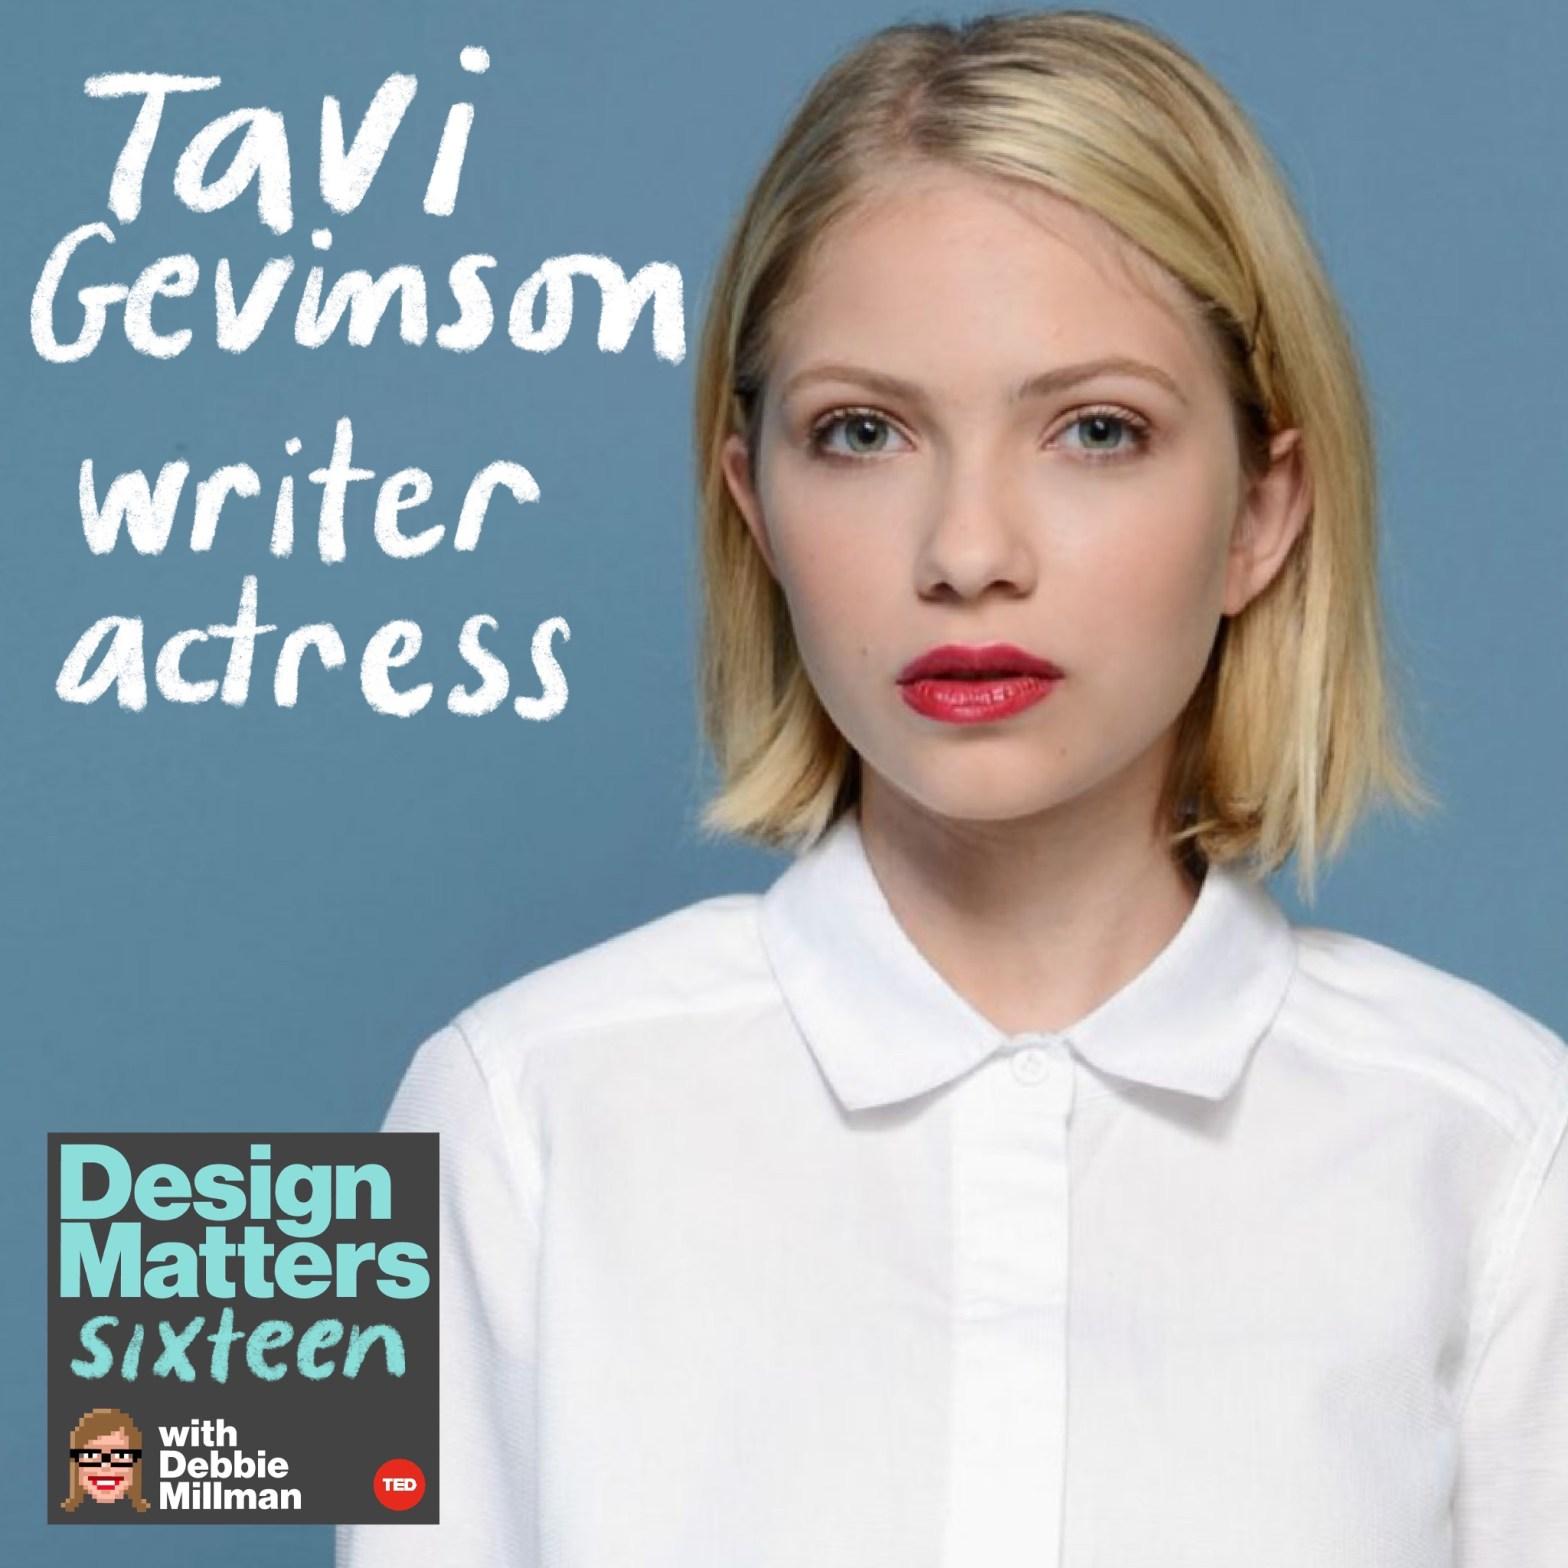 Thumbnail for Design Matters: Tavi Gevinson